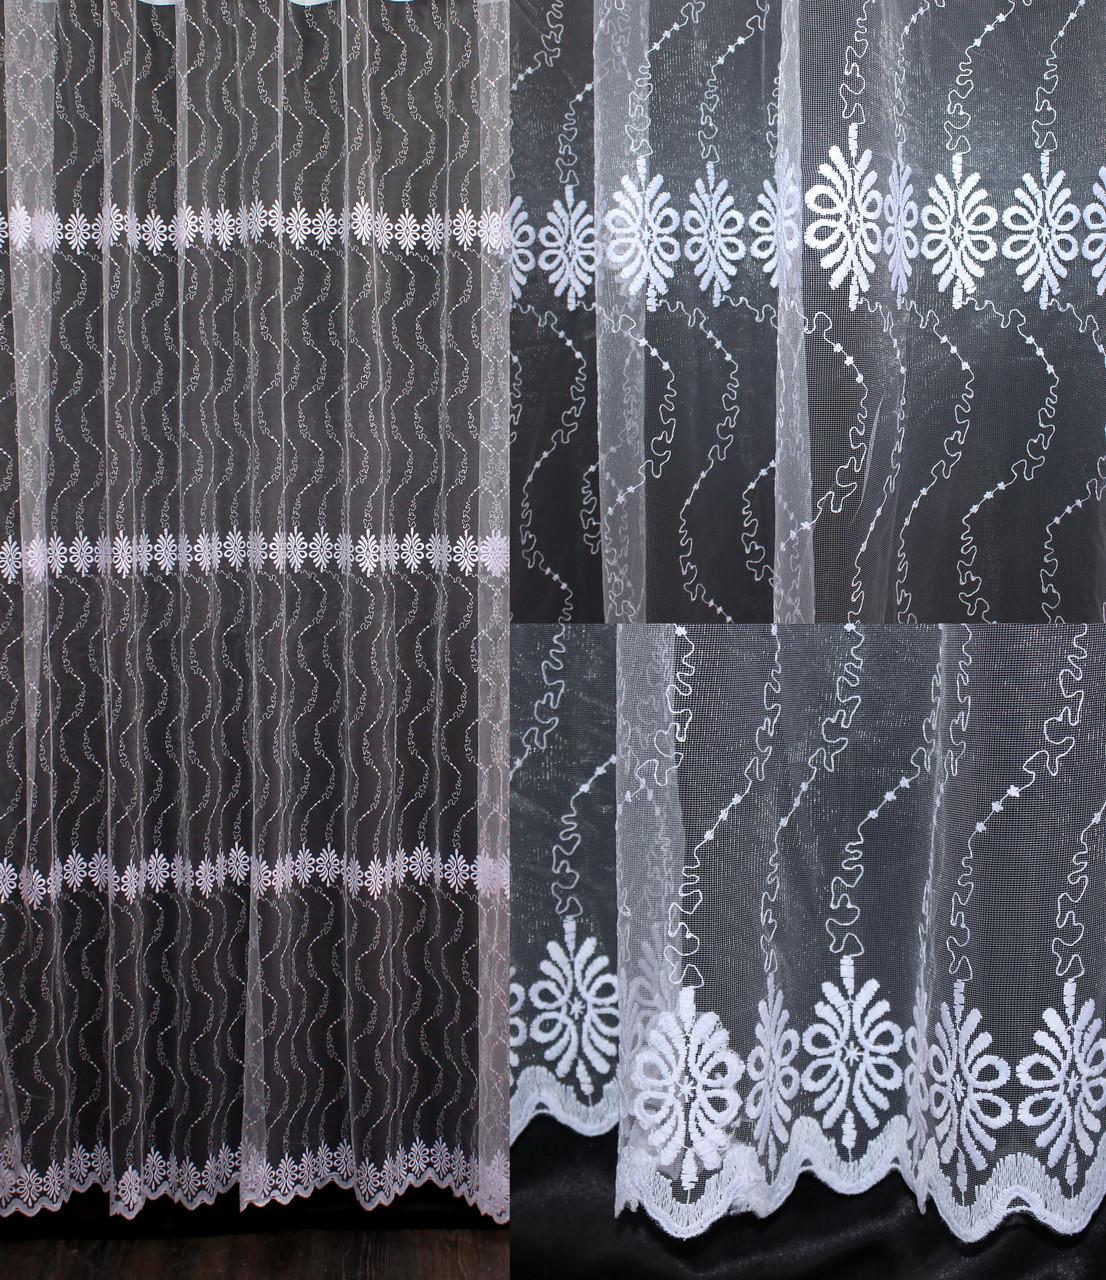 Гардина (3*2,5м) фатин с вышивкой. Цвет белый Код 547т     40-223